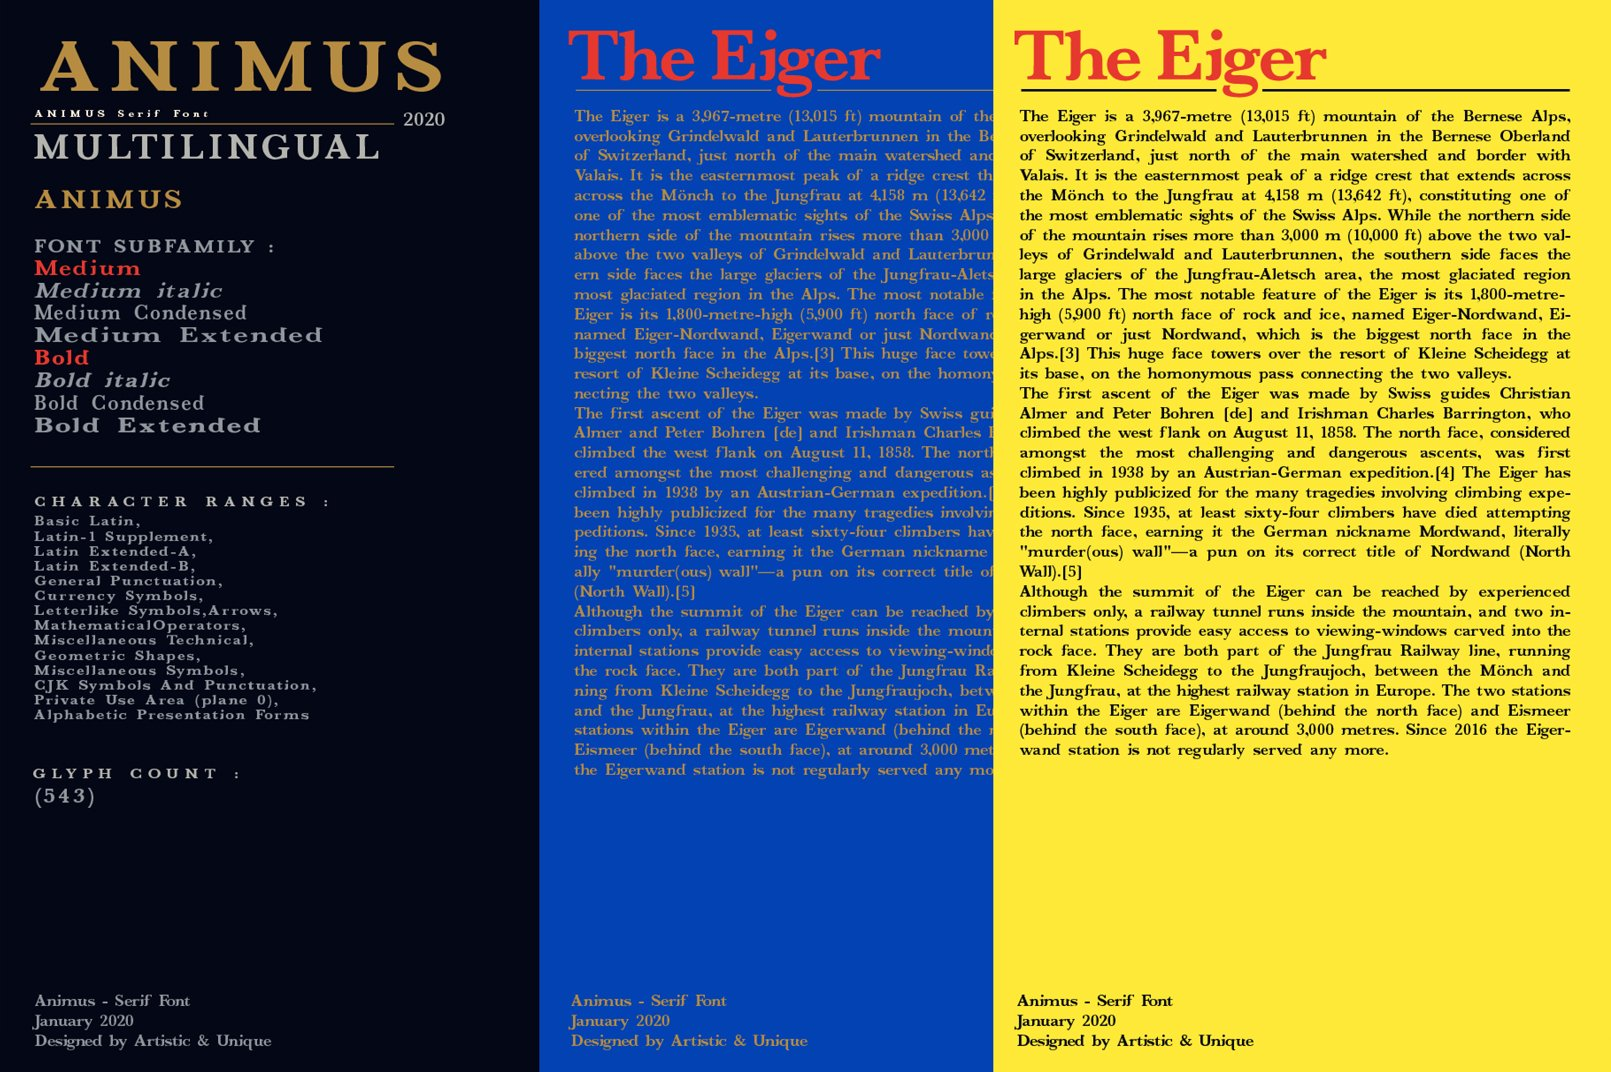 ANIMUS - Serif font family example image 6